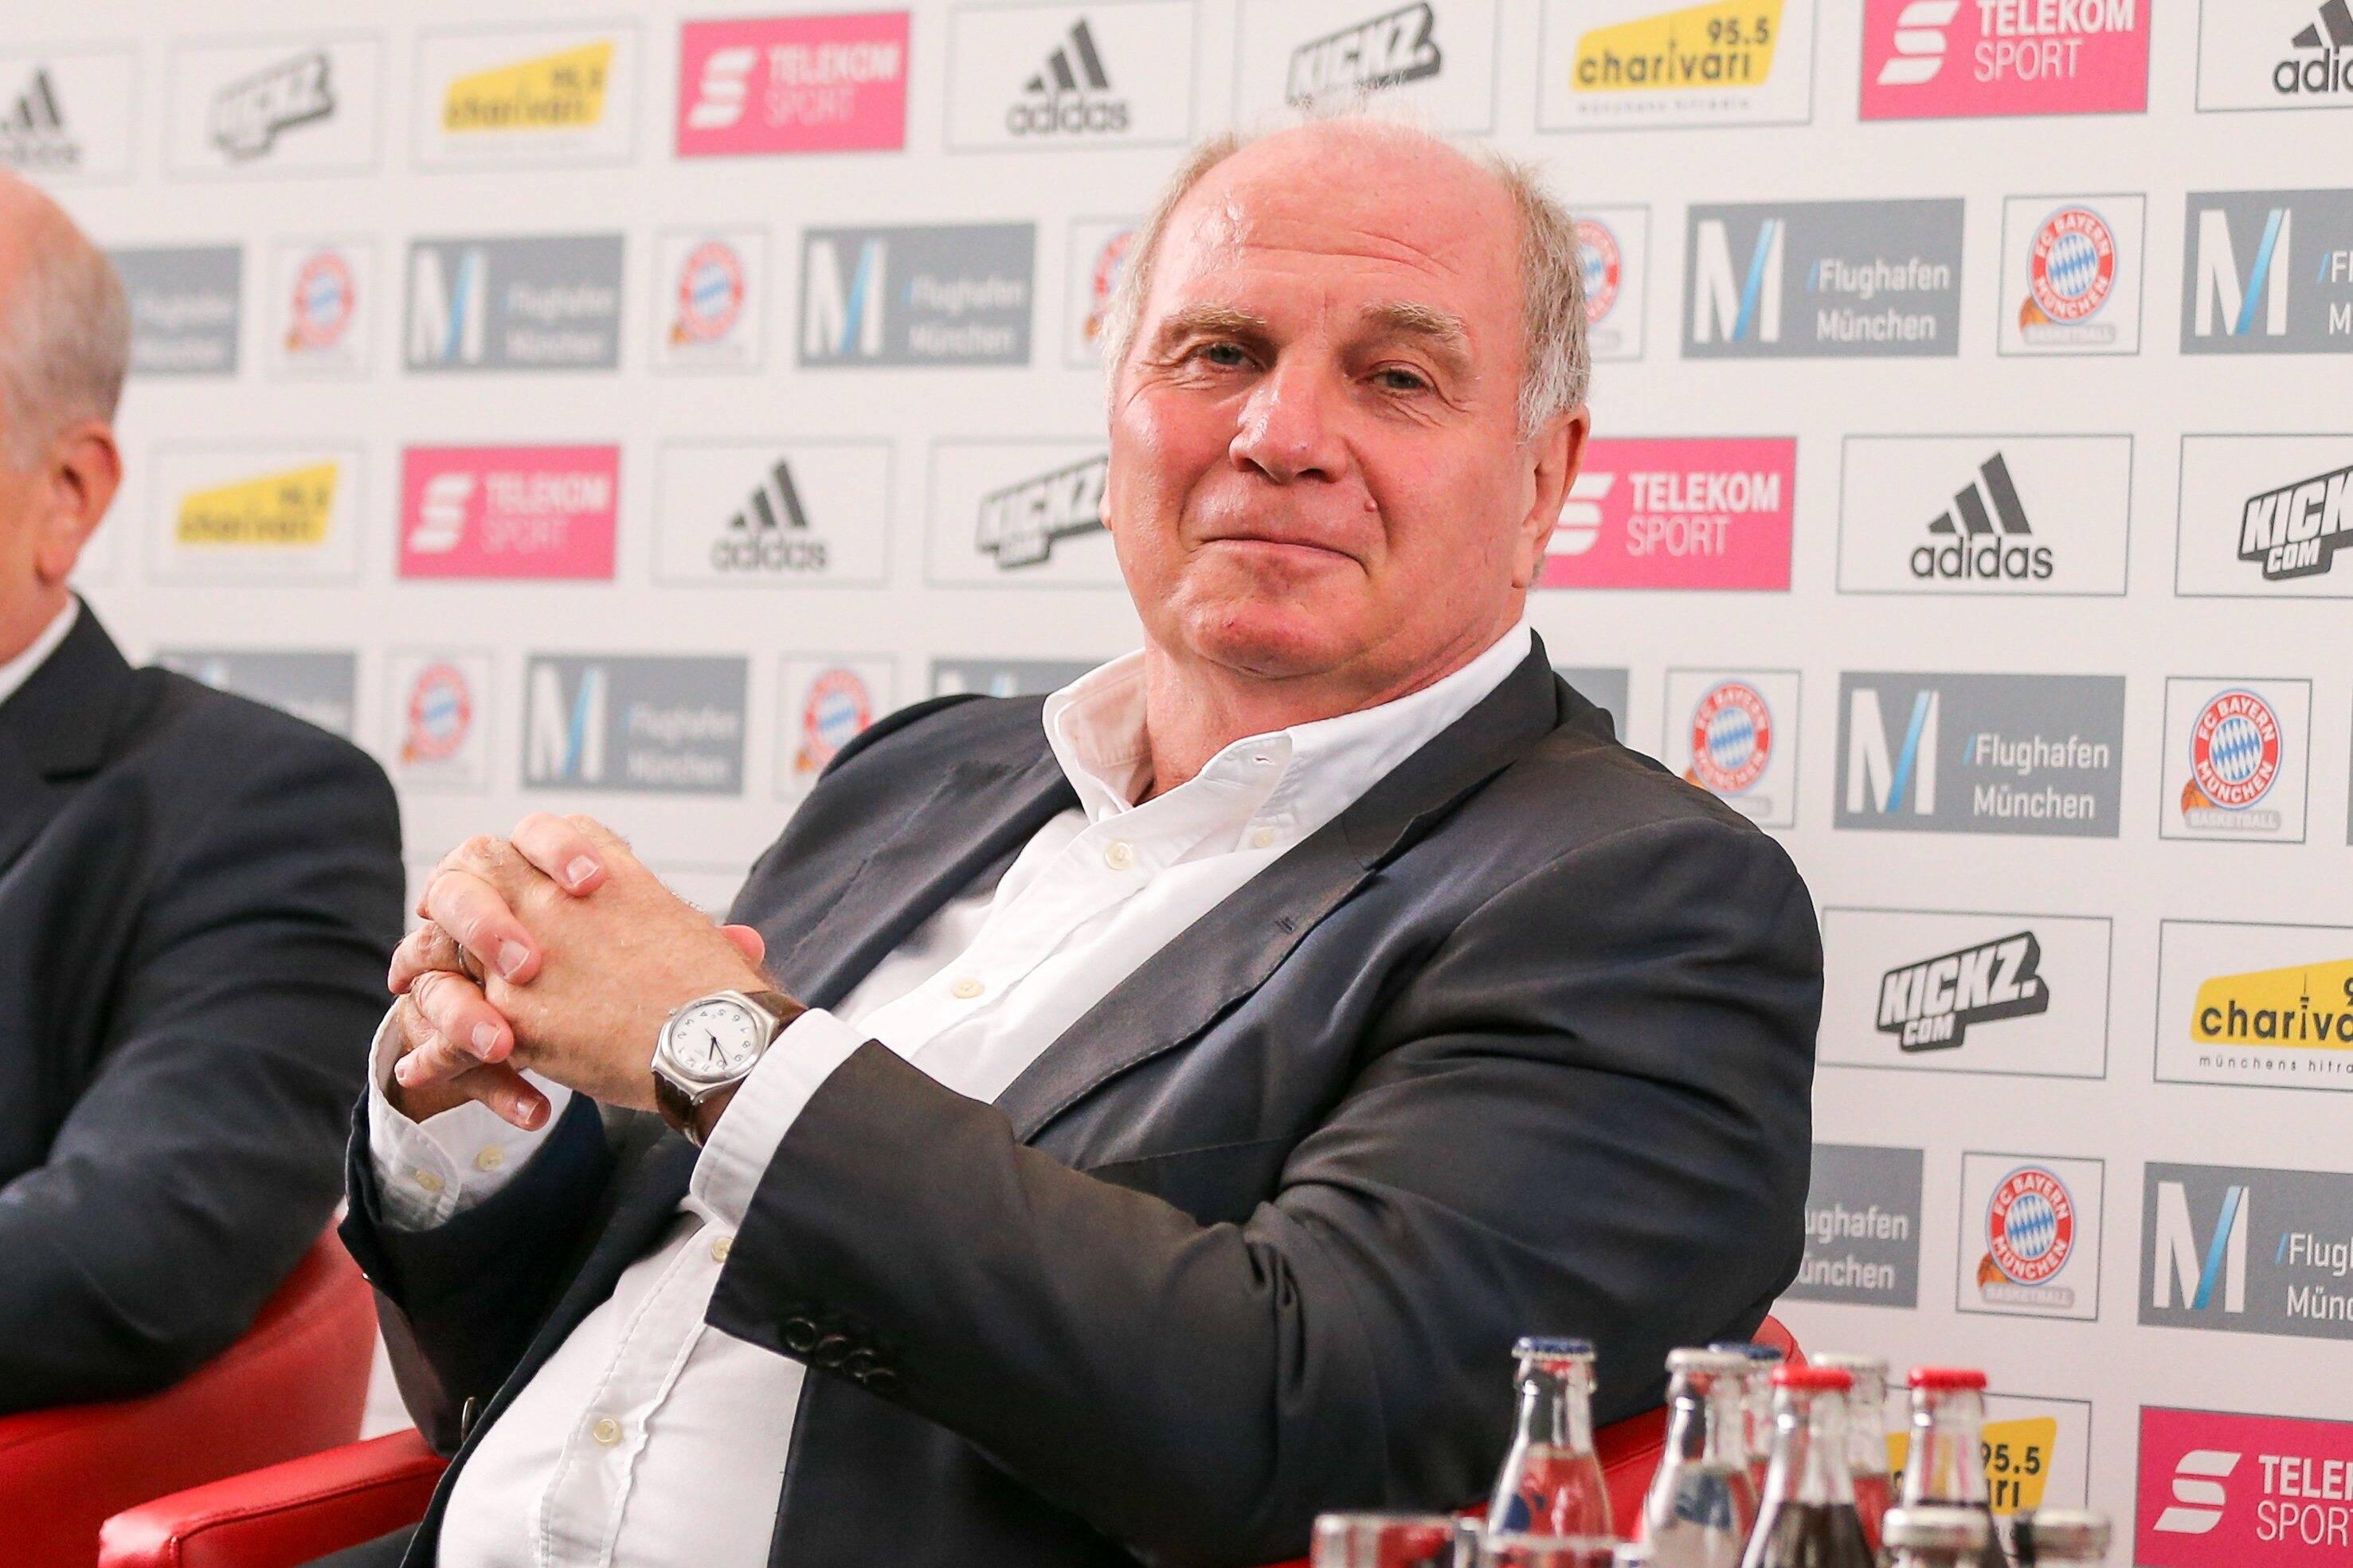 Bild zu Uli Hoeneß, FC Bayern München, Bundesliga, Präsident